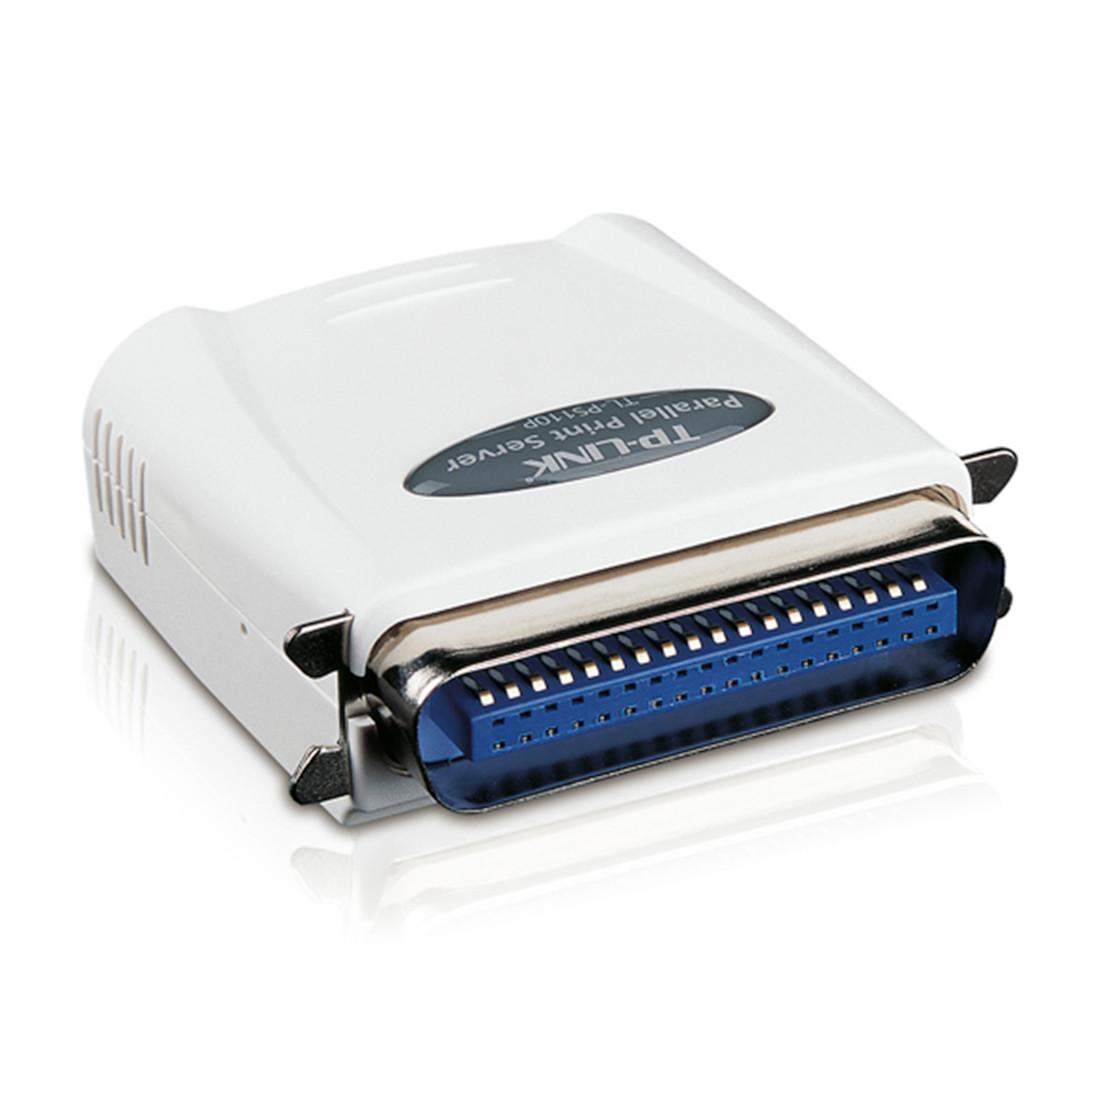 TP-LINK TL-PS110P Принт-сервер